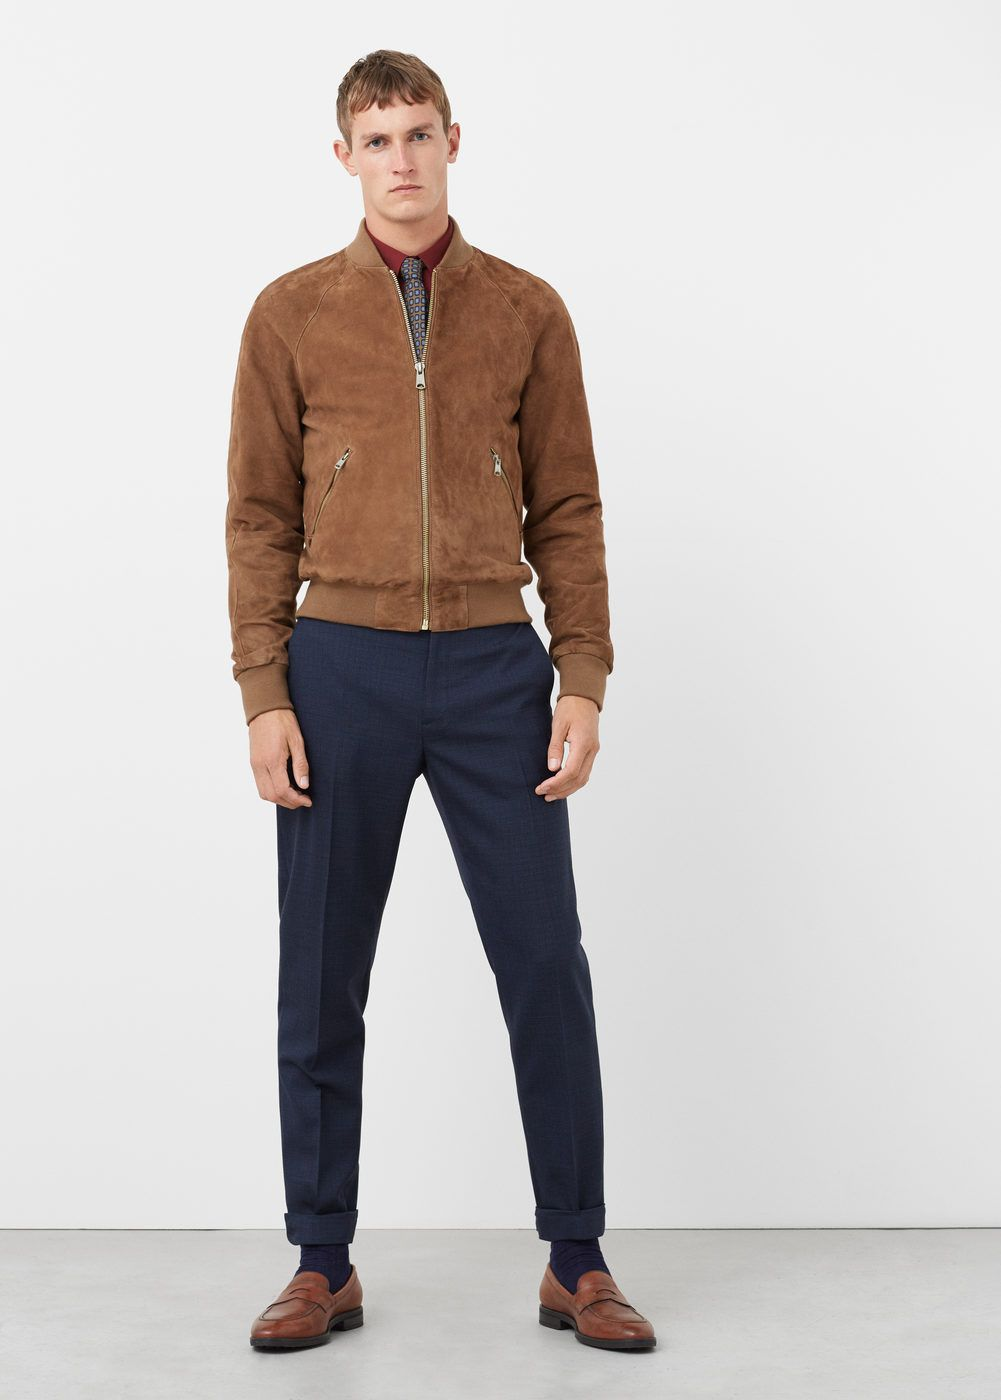 super specials coupon code united kingdom Suede bomber jacket - Men in 2019 | Bomber jacket, Jackets, Preppy ...